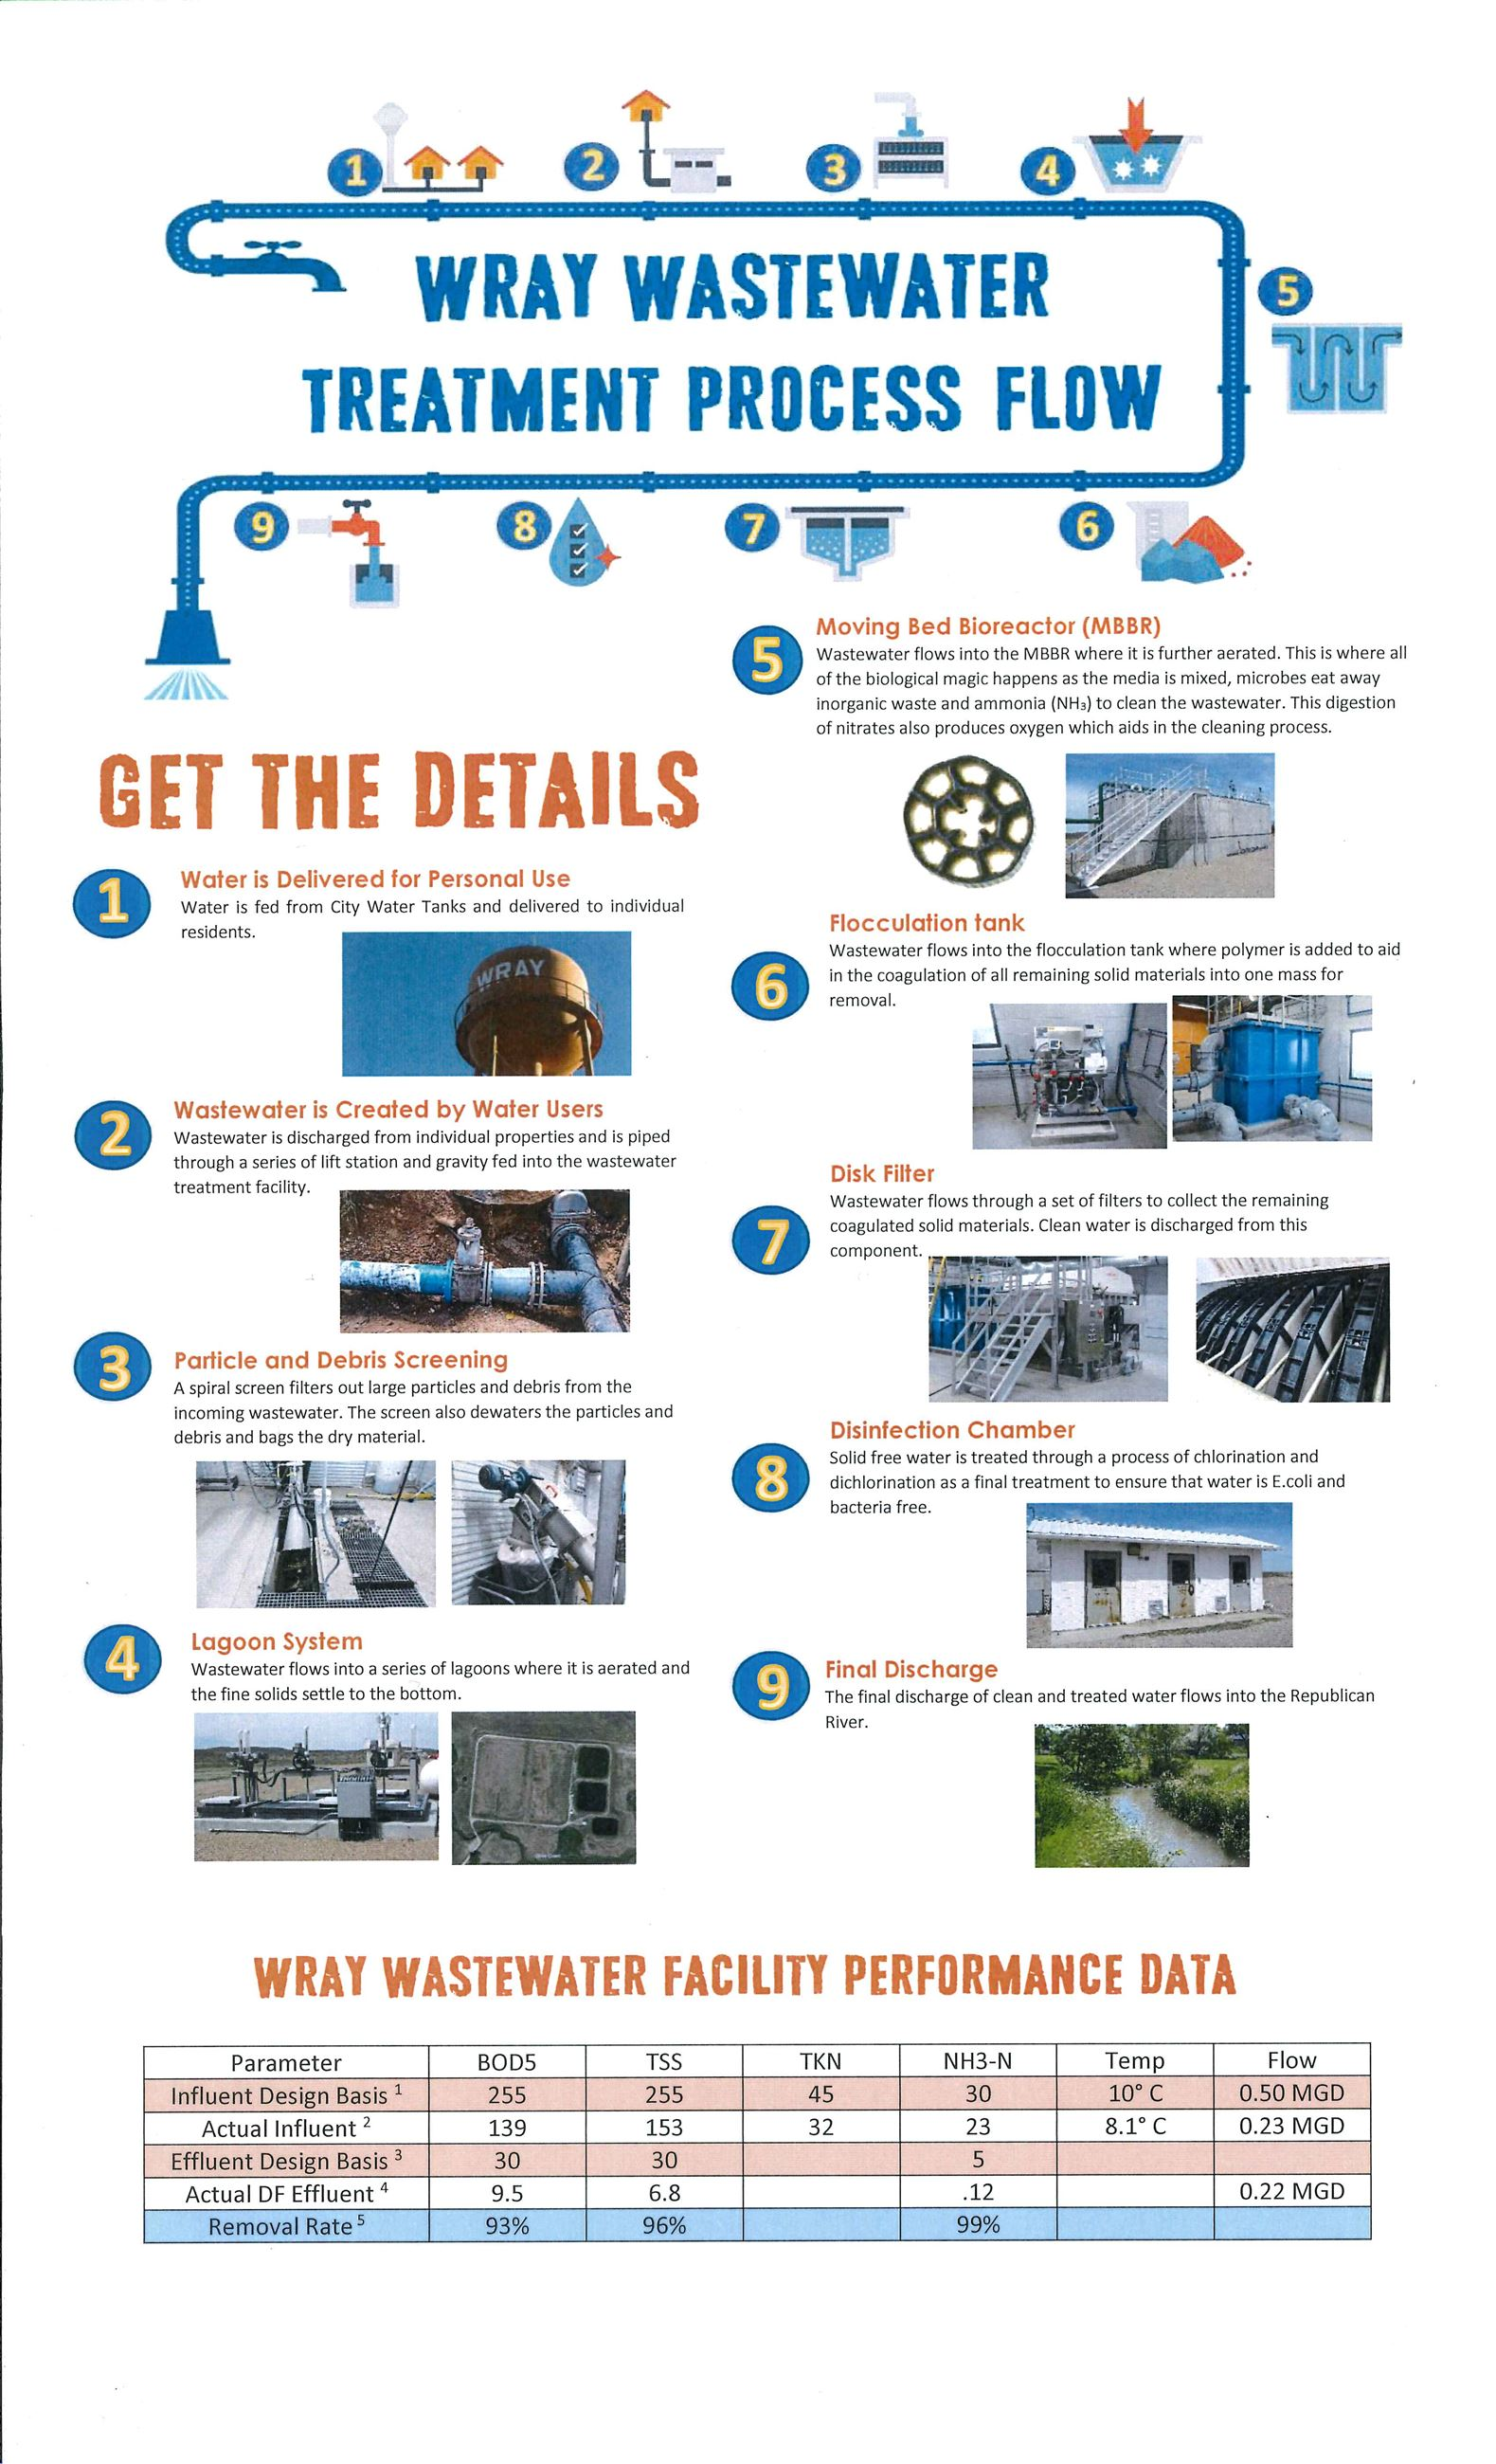 Wastewater Treatment Facility | Wray, CO